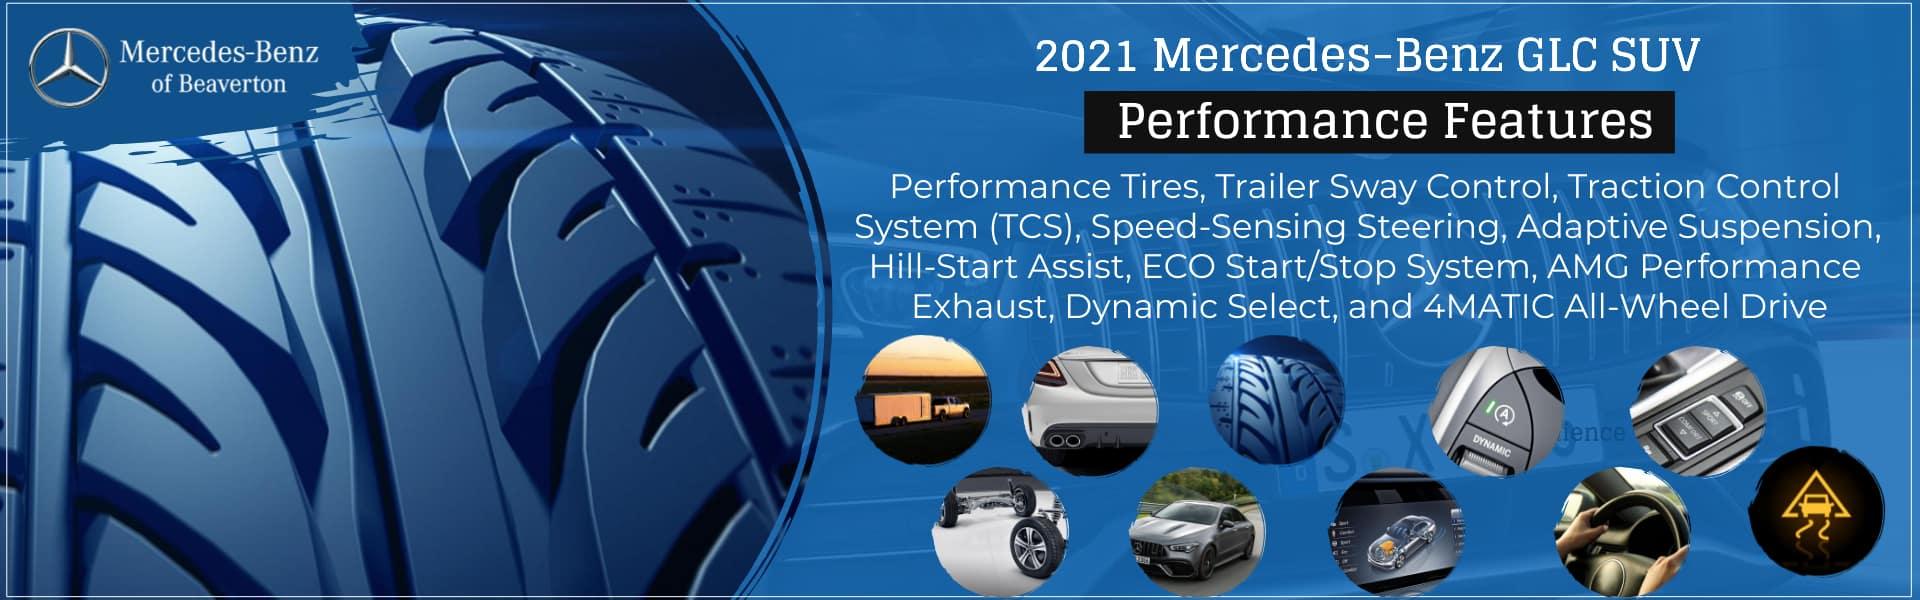 2021 Mercedes-Benz GLC SUV of Beaverton Performance Features